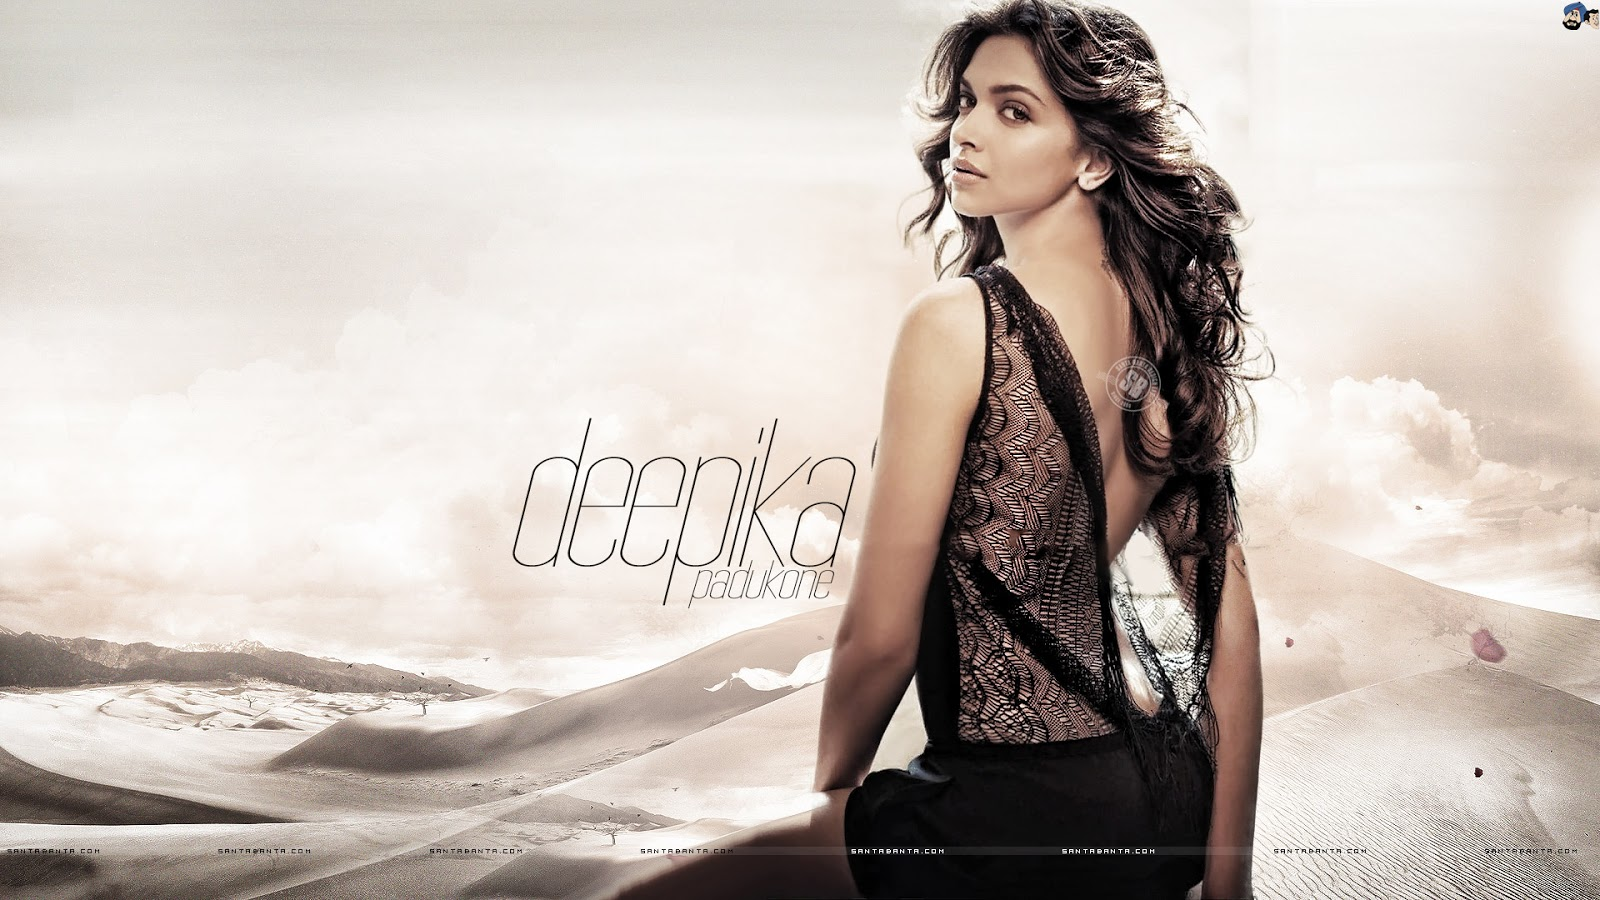 Deepika Padukone Sexiest Wallpapers Collection 2013